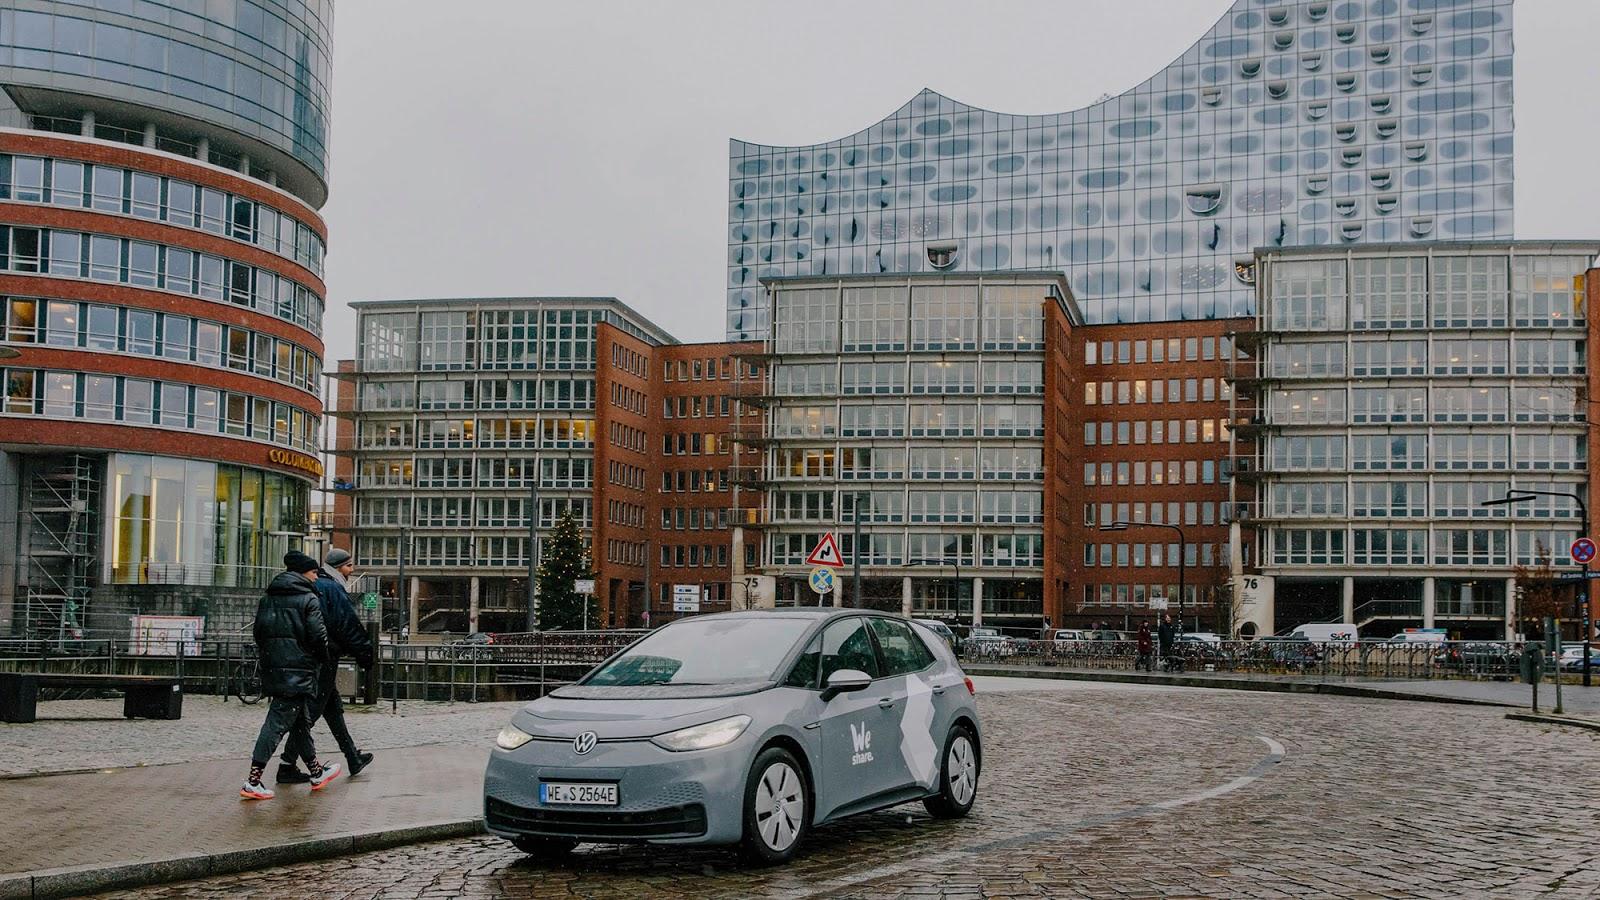 VOLKSWAGEN WESHARE HAMBURG 1 Volkswagen : Ξεκινά car sharing ηλεκτρικών αυτοκινήτων στο Αμβούργο car sharing, Electric cars, electric vehicles, ID.3, Volkswagen, Volkswagen ID.3, VW ID.3, ειδήσεις, ηλεκτρικά, ηλεκτροκινηση